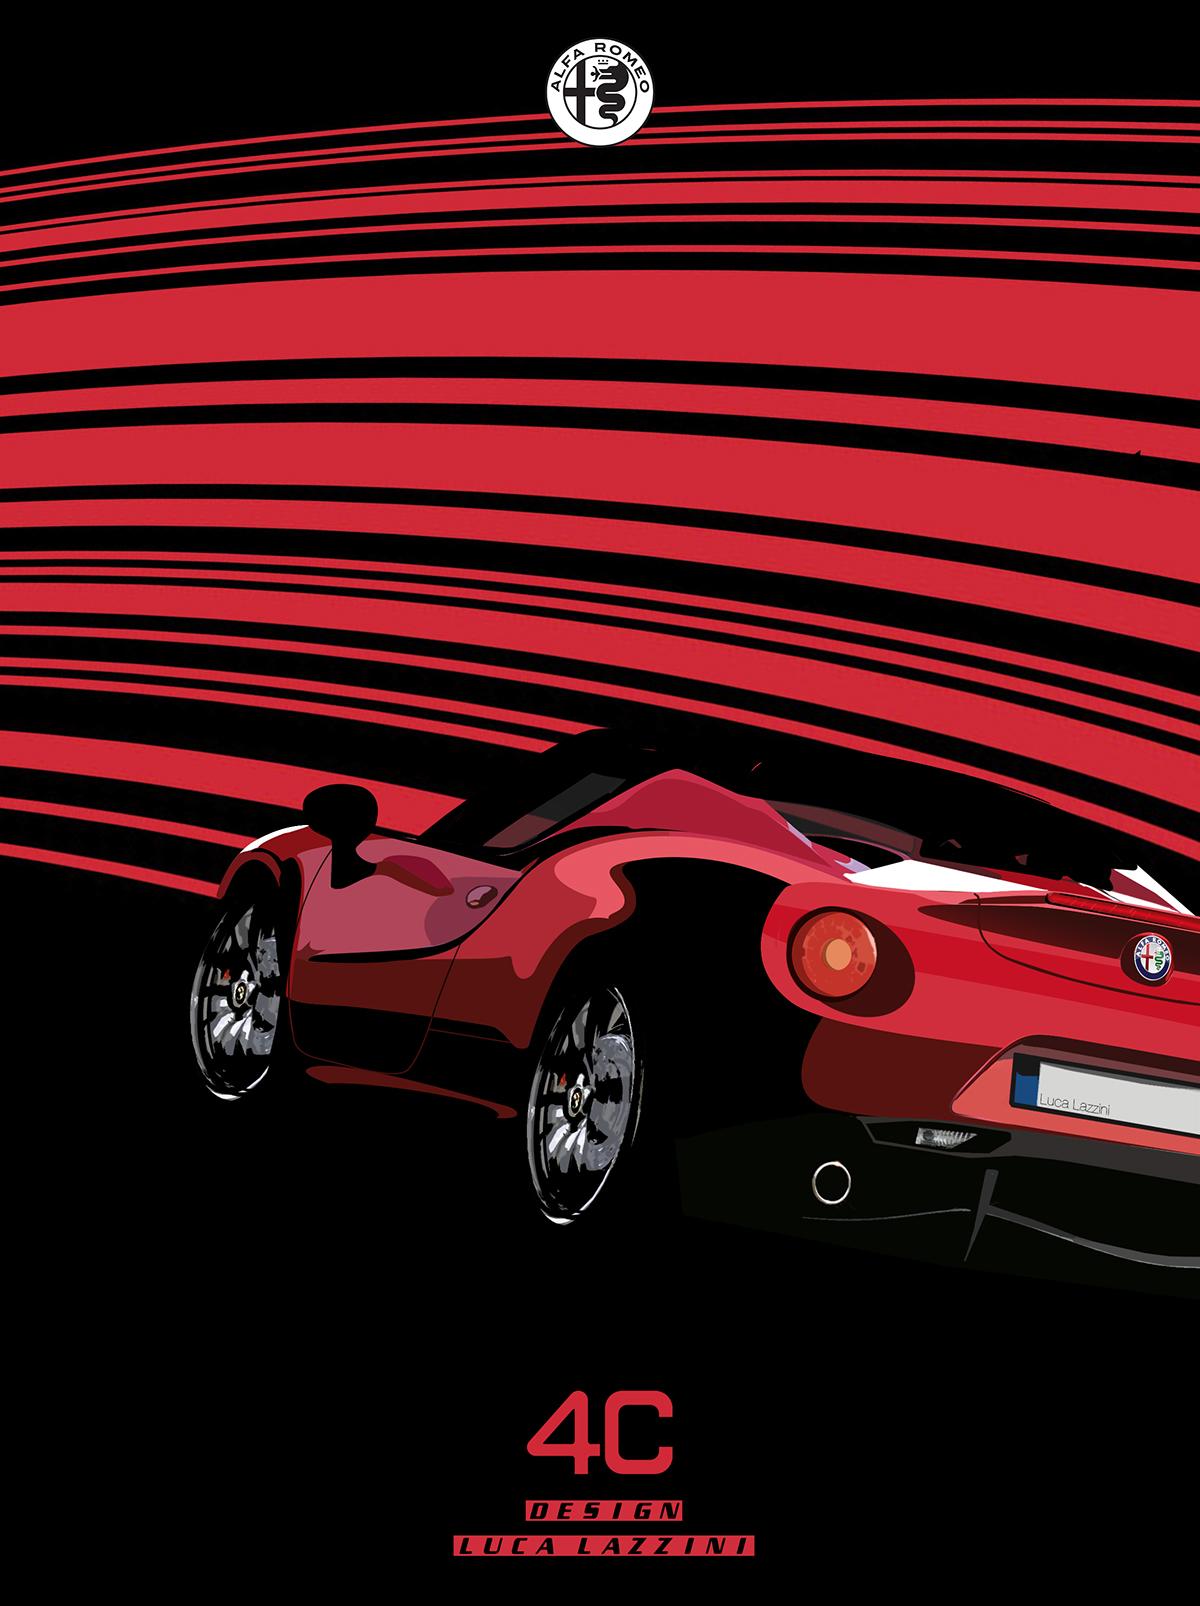 Alfa Romeo C Poster On Behance - Alfa romeo poster